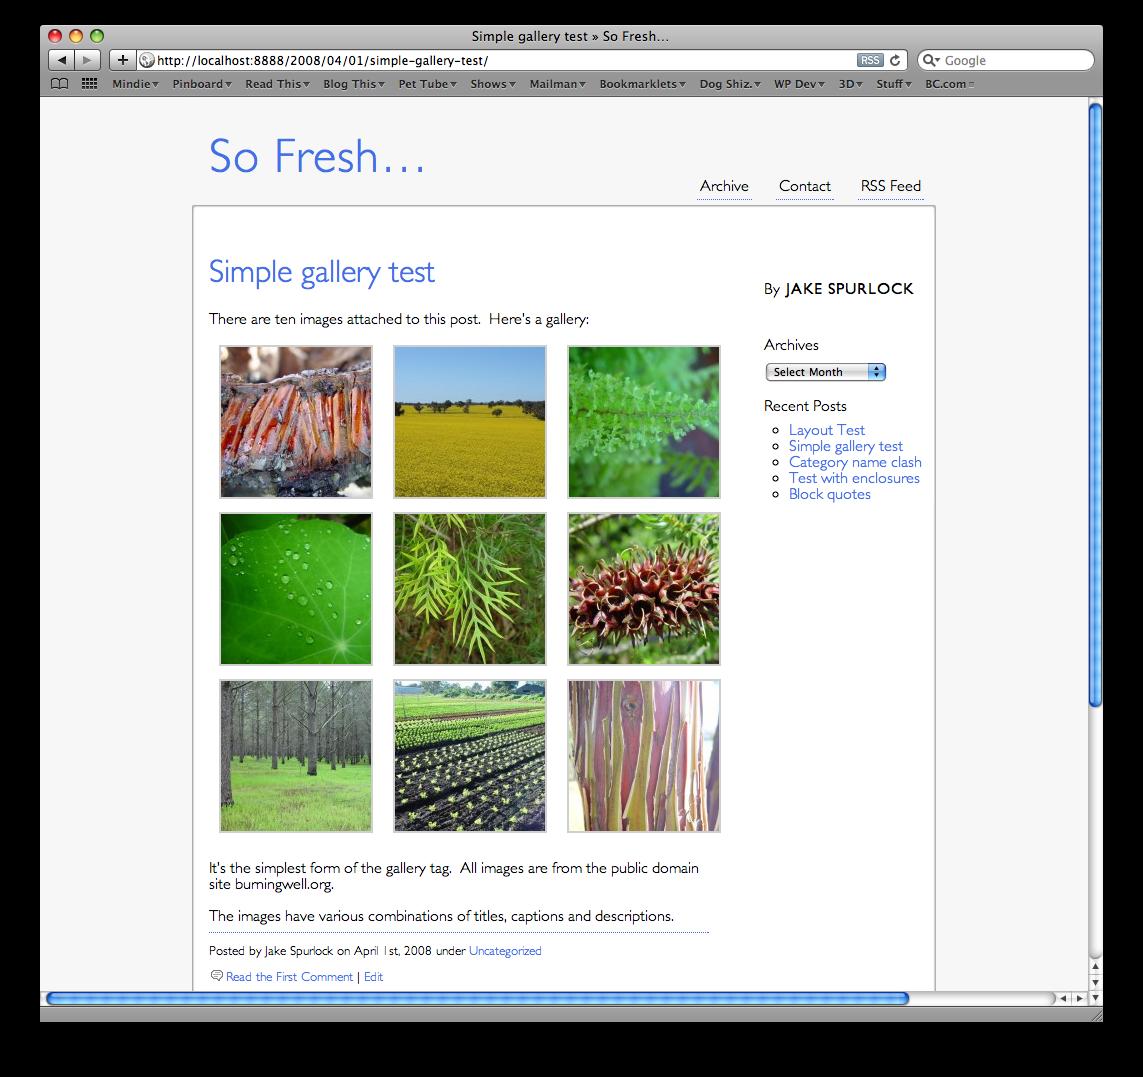 So Fresh... free wordpress theme